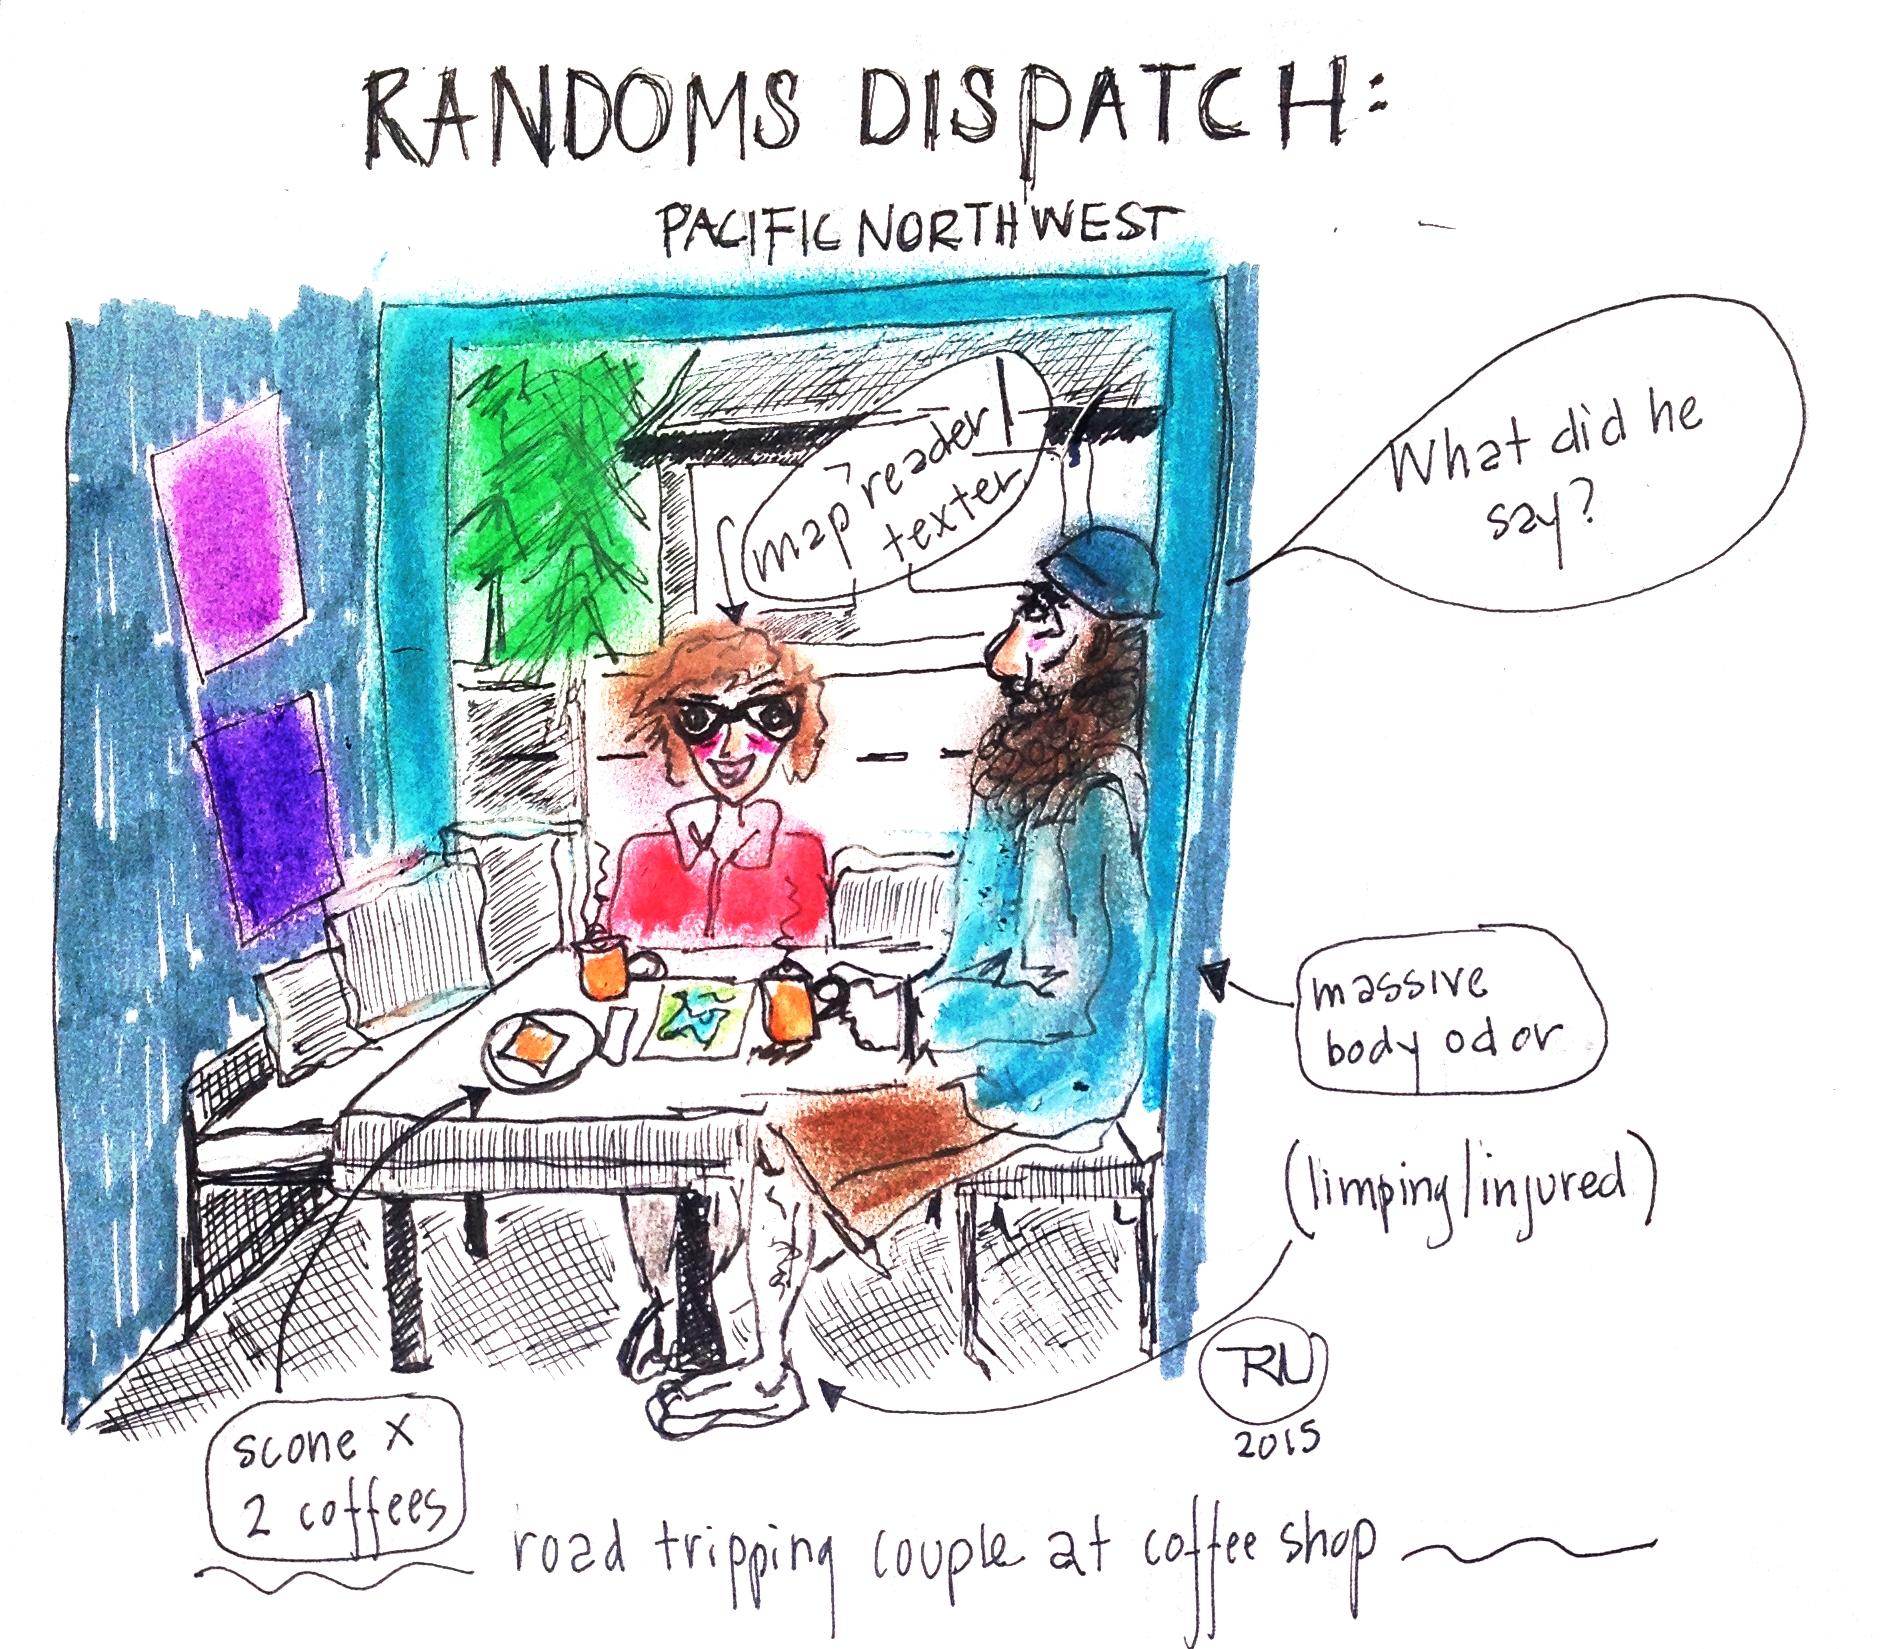 """Randoms Dispatch"" series. Coffee shop scene in PNW."